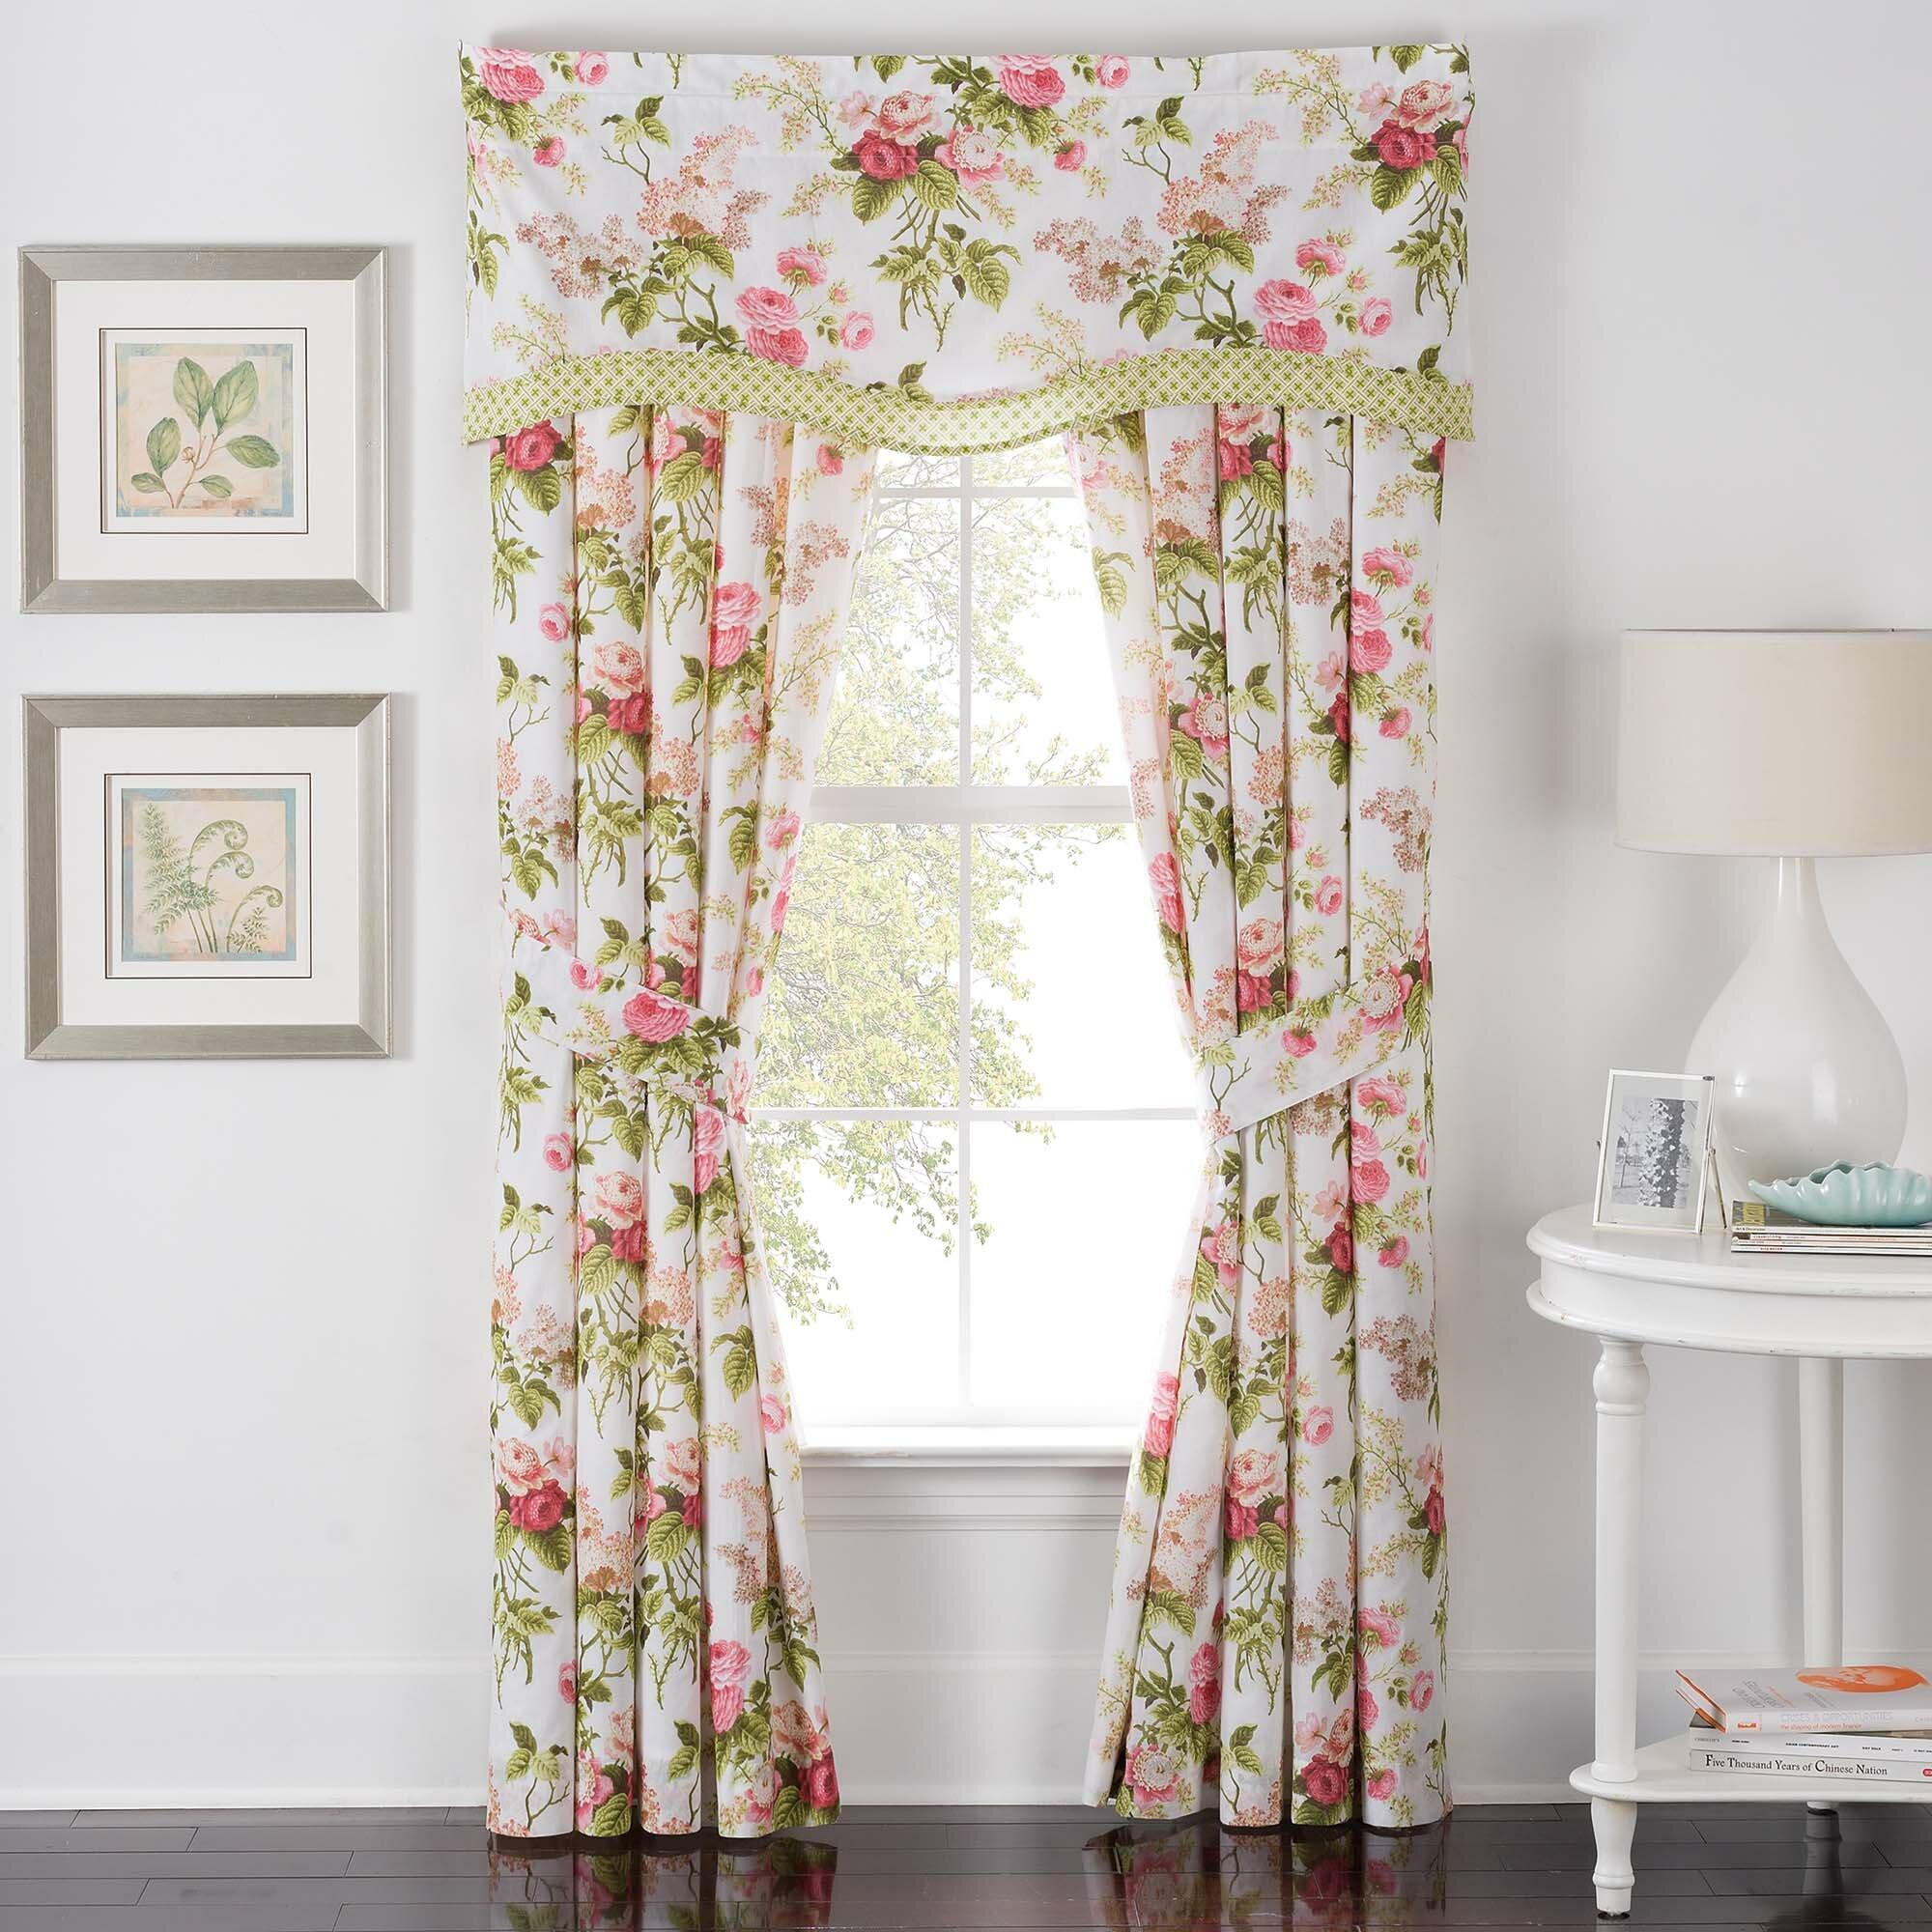 Waverly Emma 39 S Garden 52 Lined Window Curtain Valance Reviews Wayfair